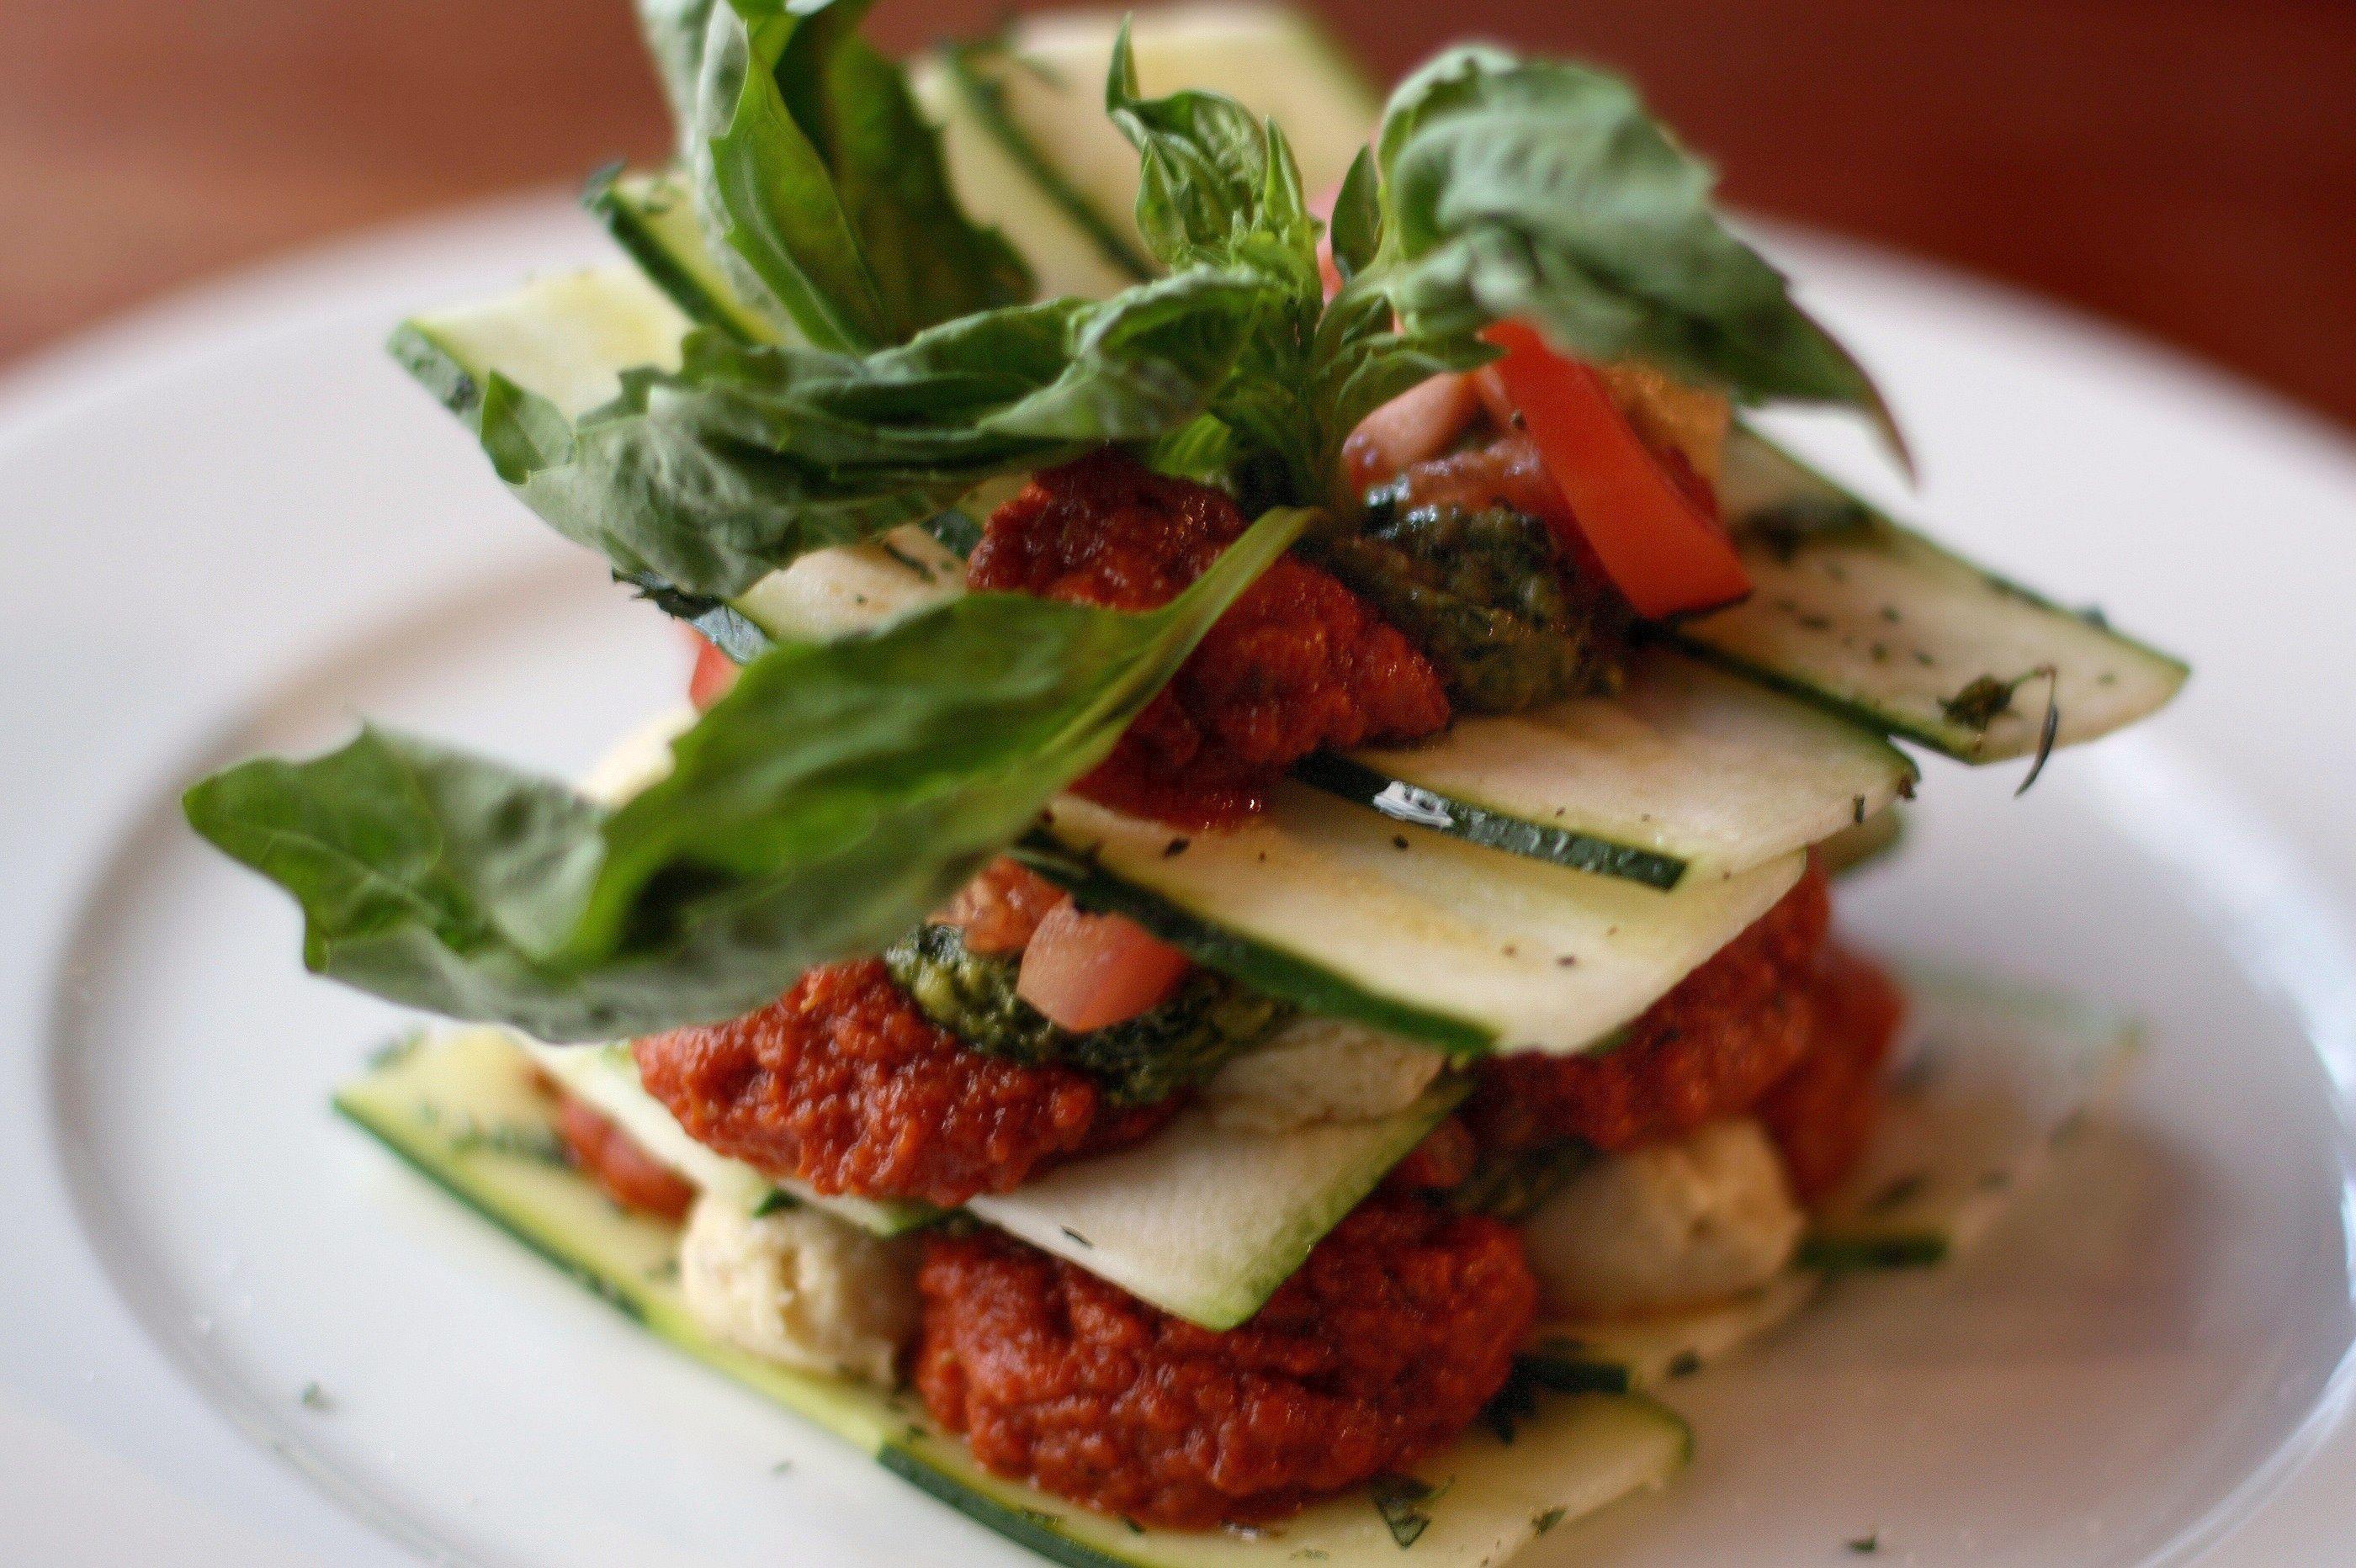 Rawfood lasagna recipes vegan vegan raw food recipes pinterest rawfood lasagna recipes vegan forumfinder Images